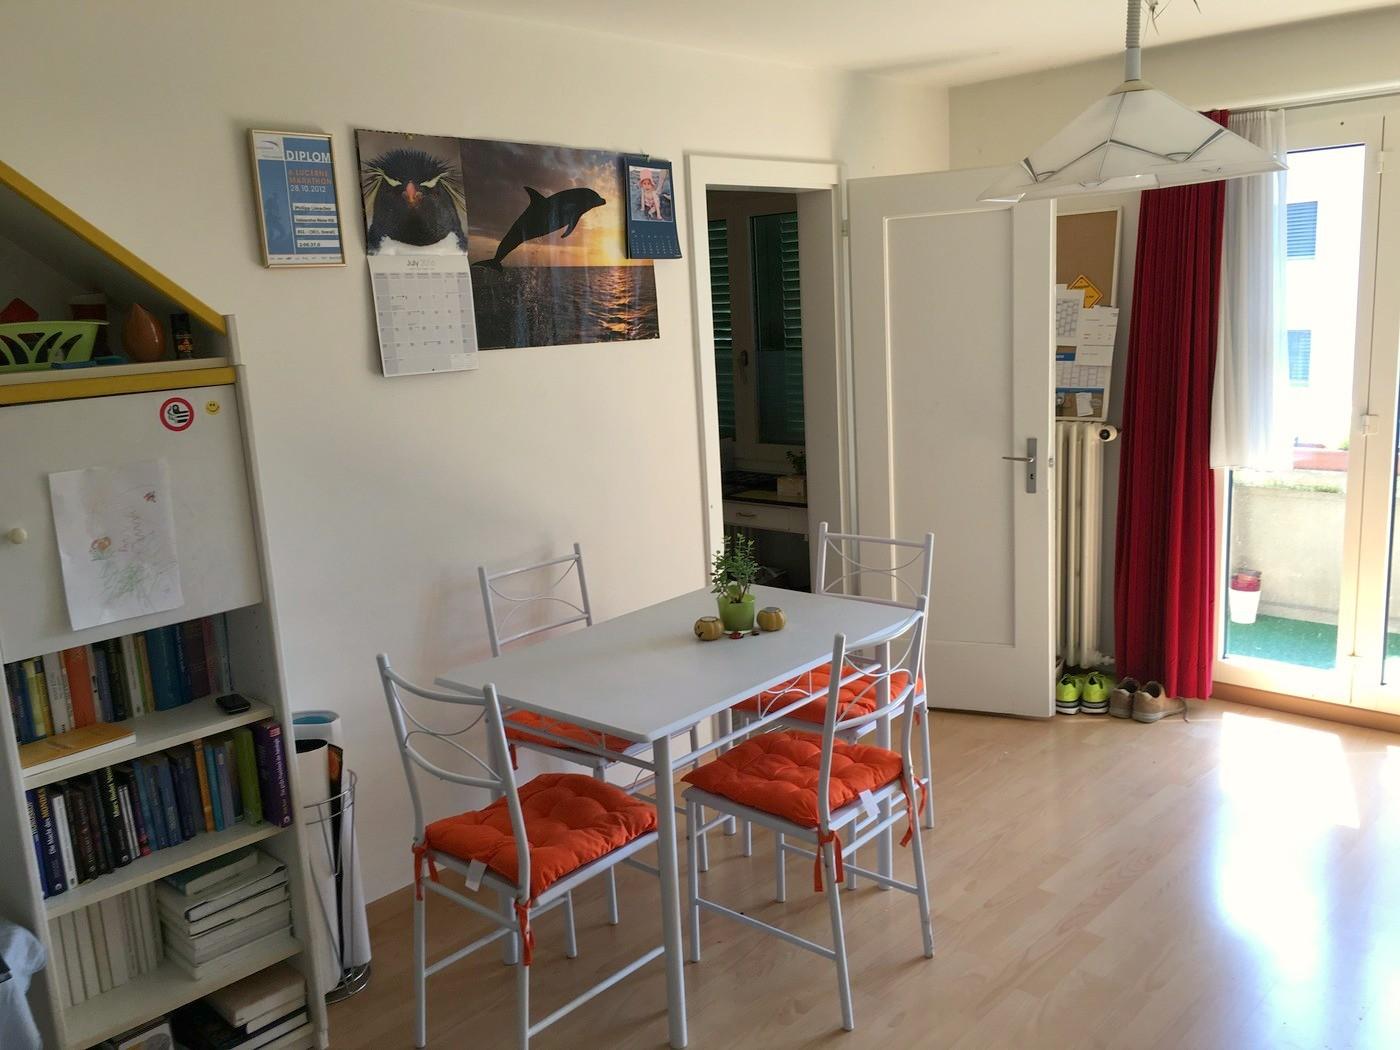 1 zimmer wohnung in kriens mieten flatfox. Black Bedroom Furniture Sets. Home Design Ideas